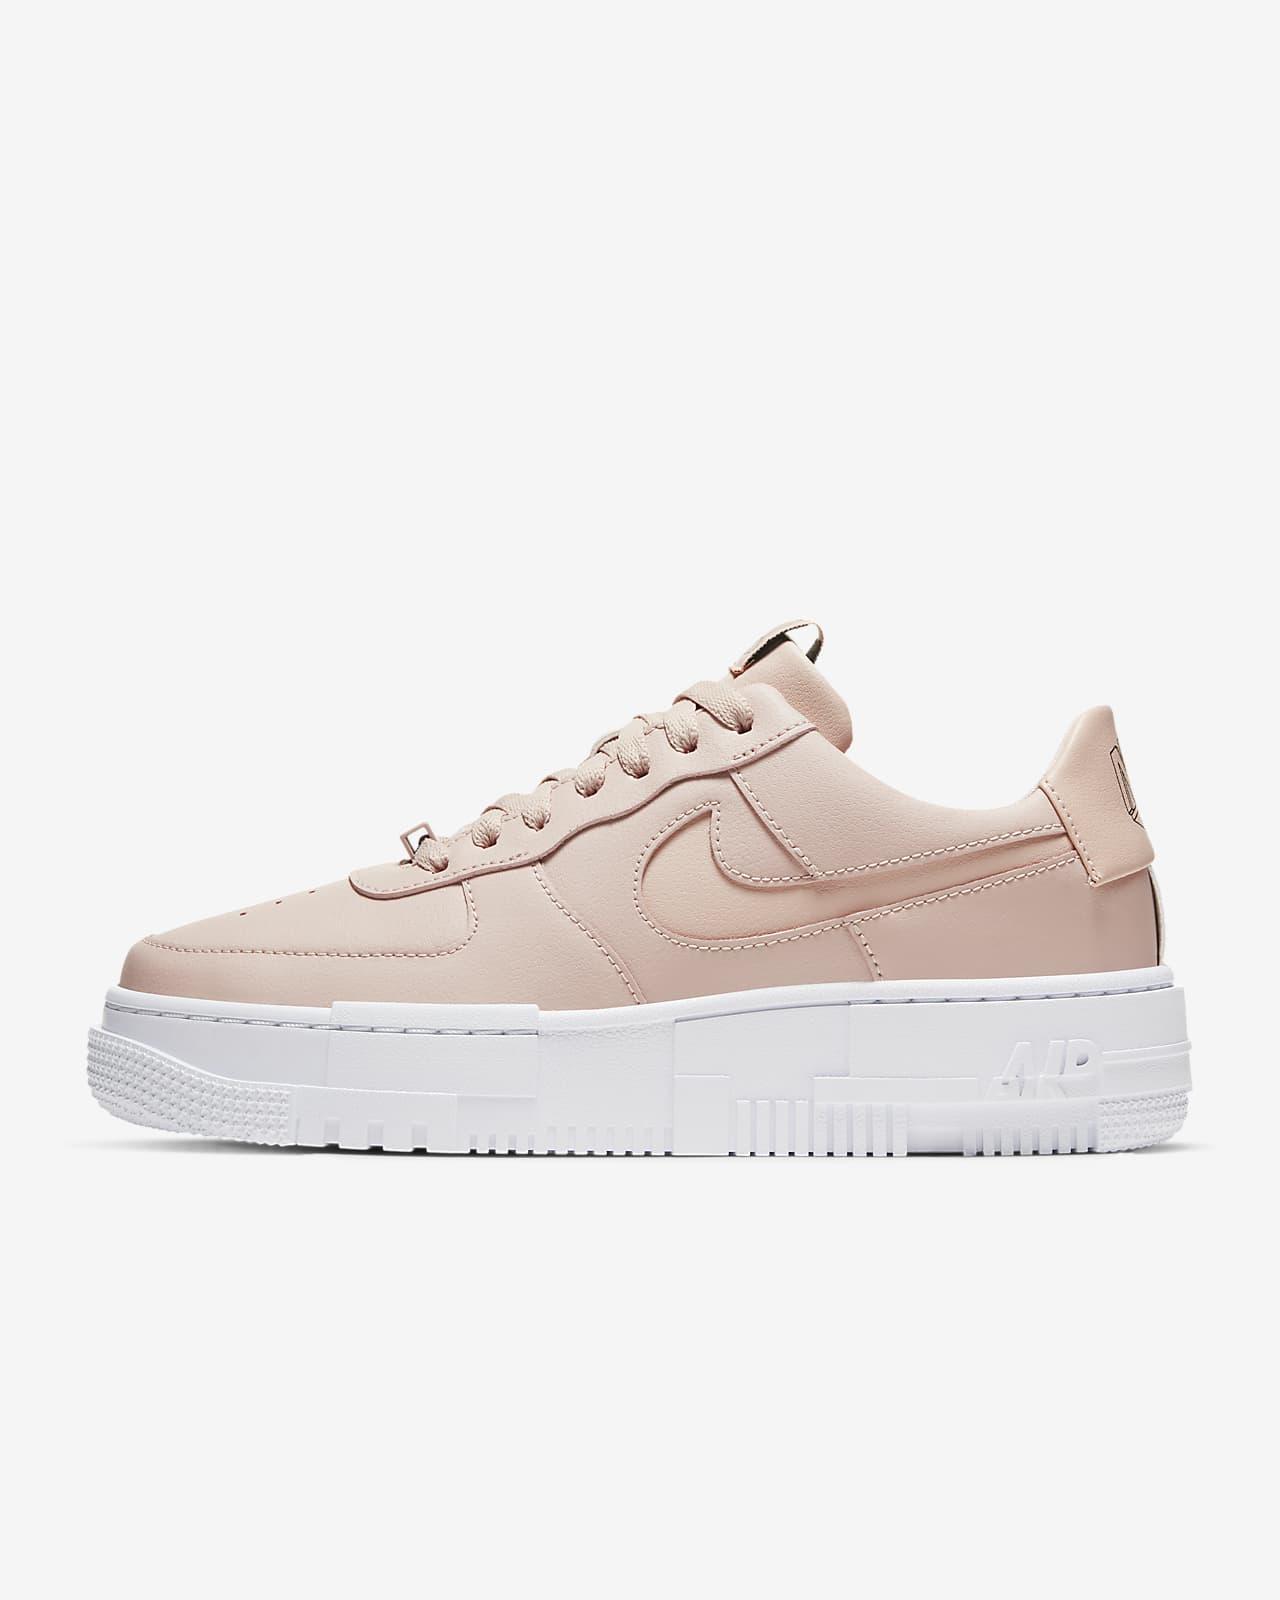 Calzado para mujer Nike Air Force 1 Pixel